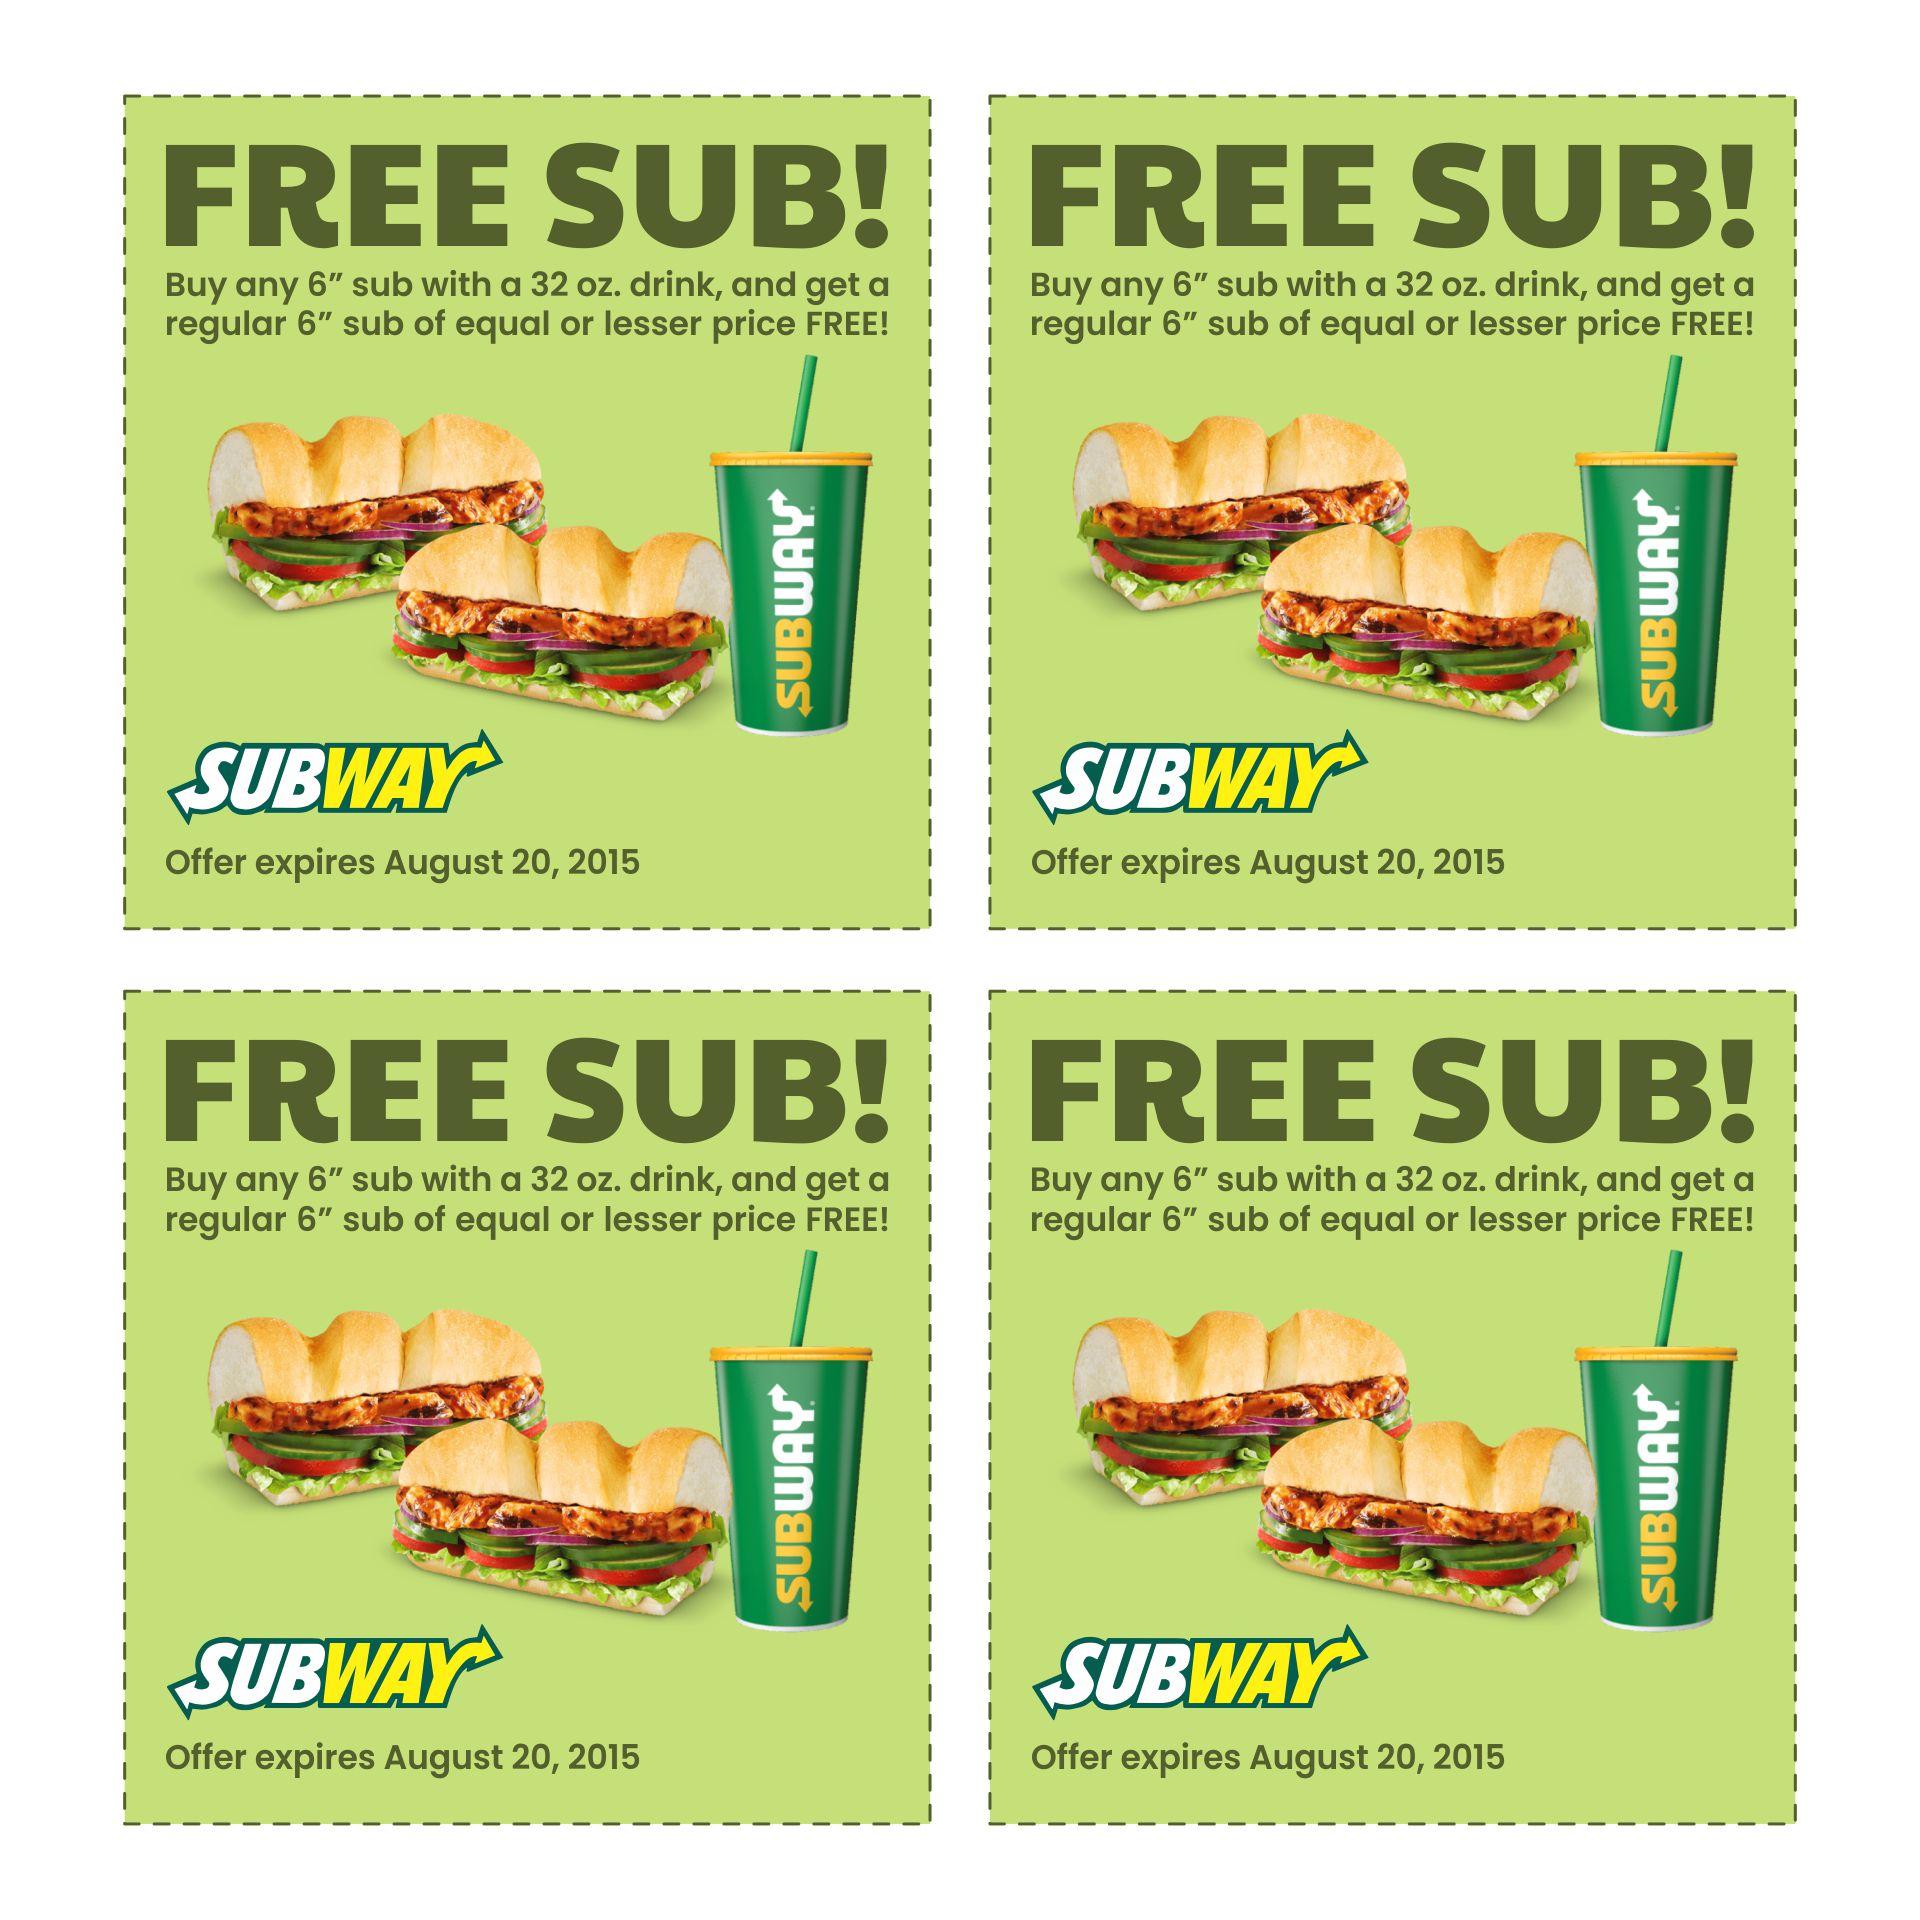 2015 Subway Coupons Printable